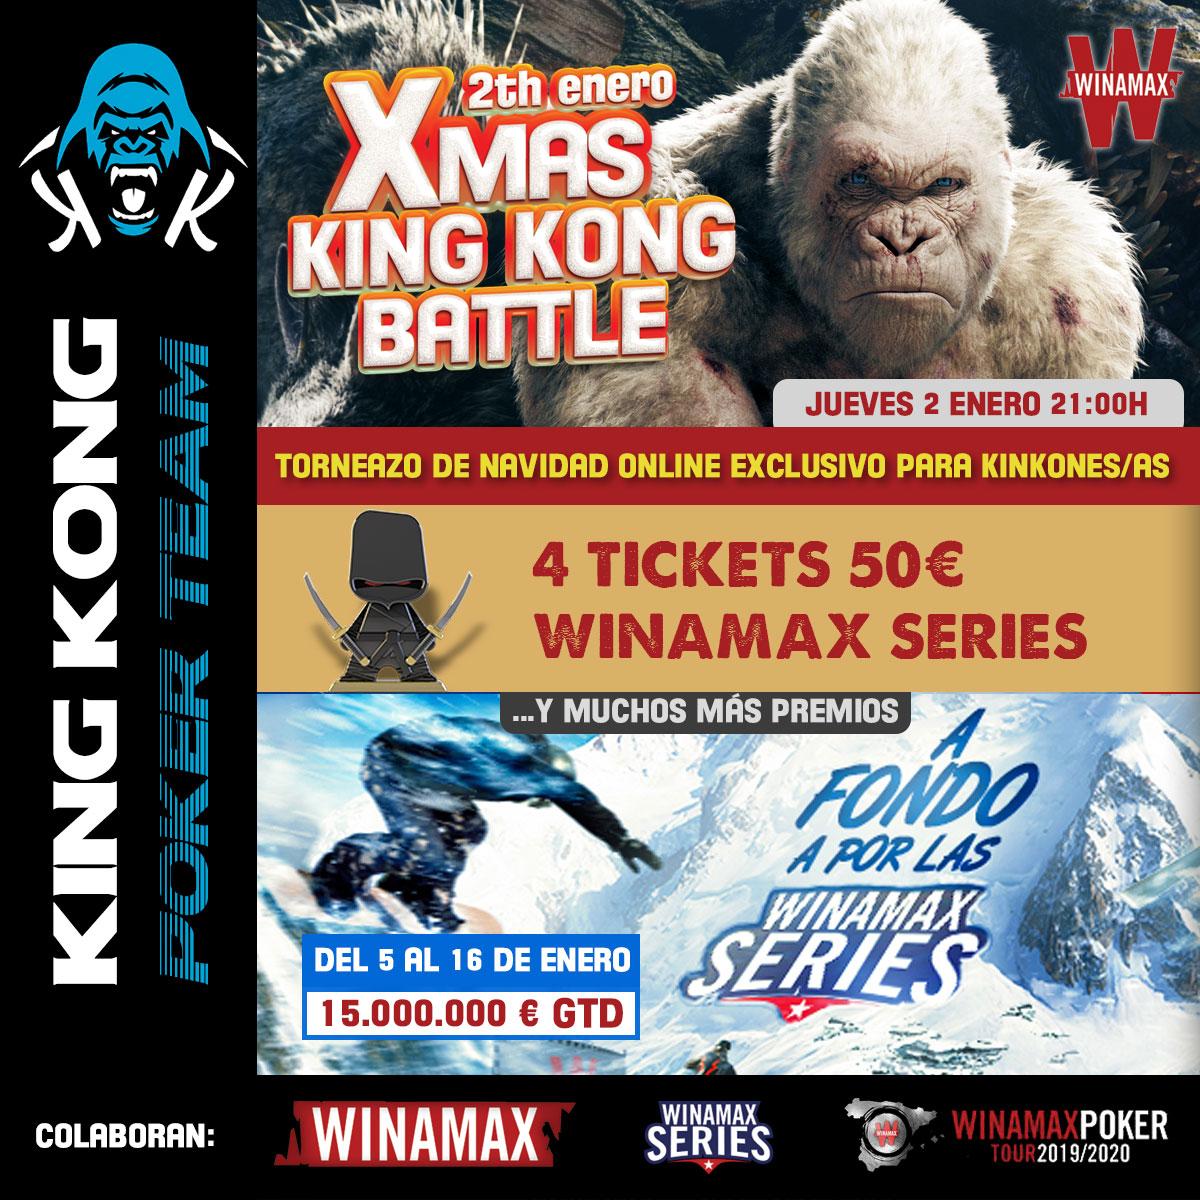 20181207_PROMO_XMAS_King_Kong_Battle_banner_series_web